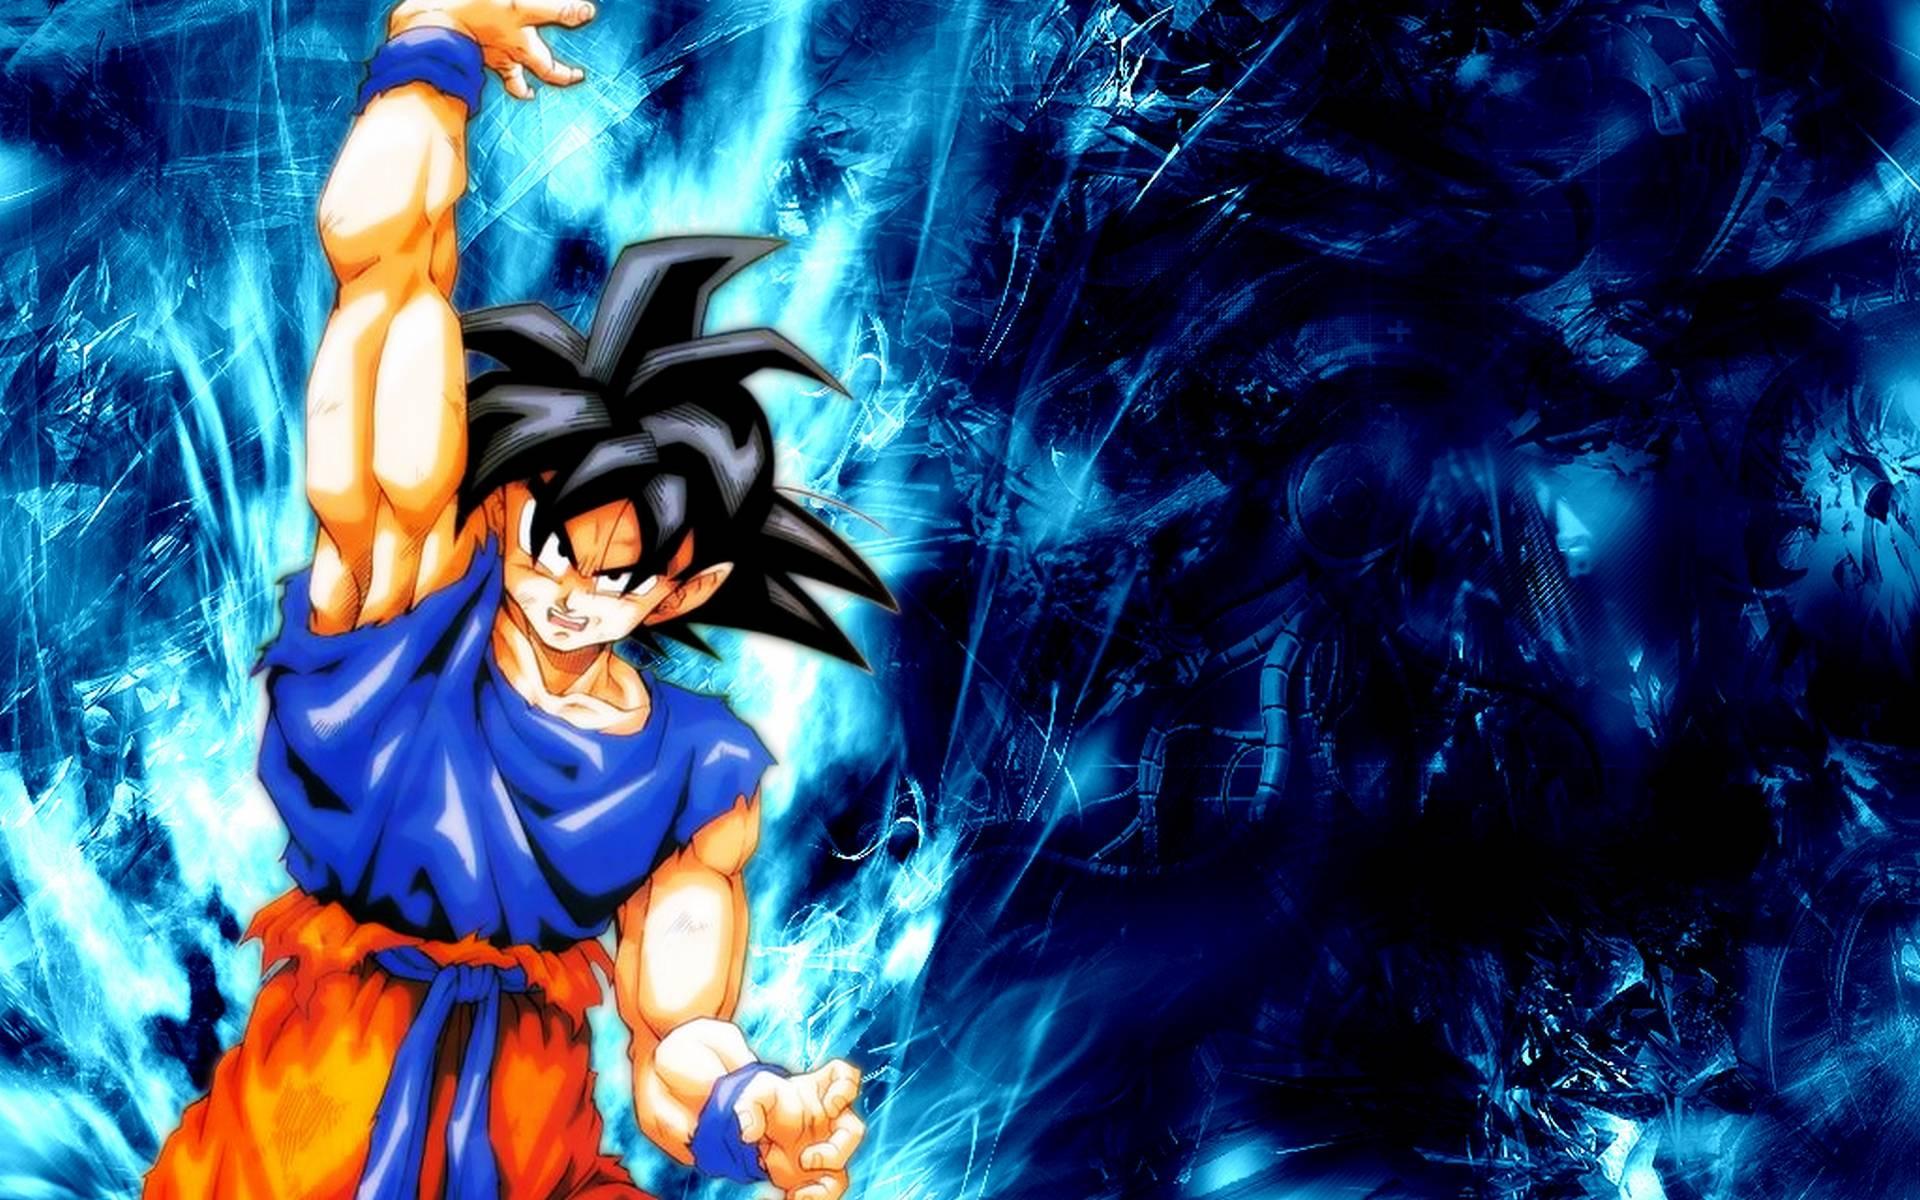 Son Goku Wallpapers - Wallpaper Cave